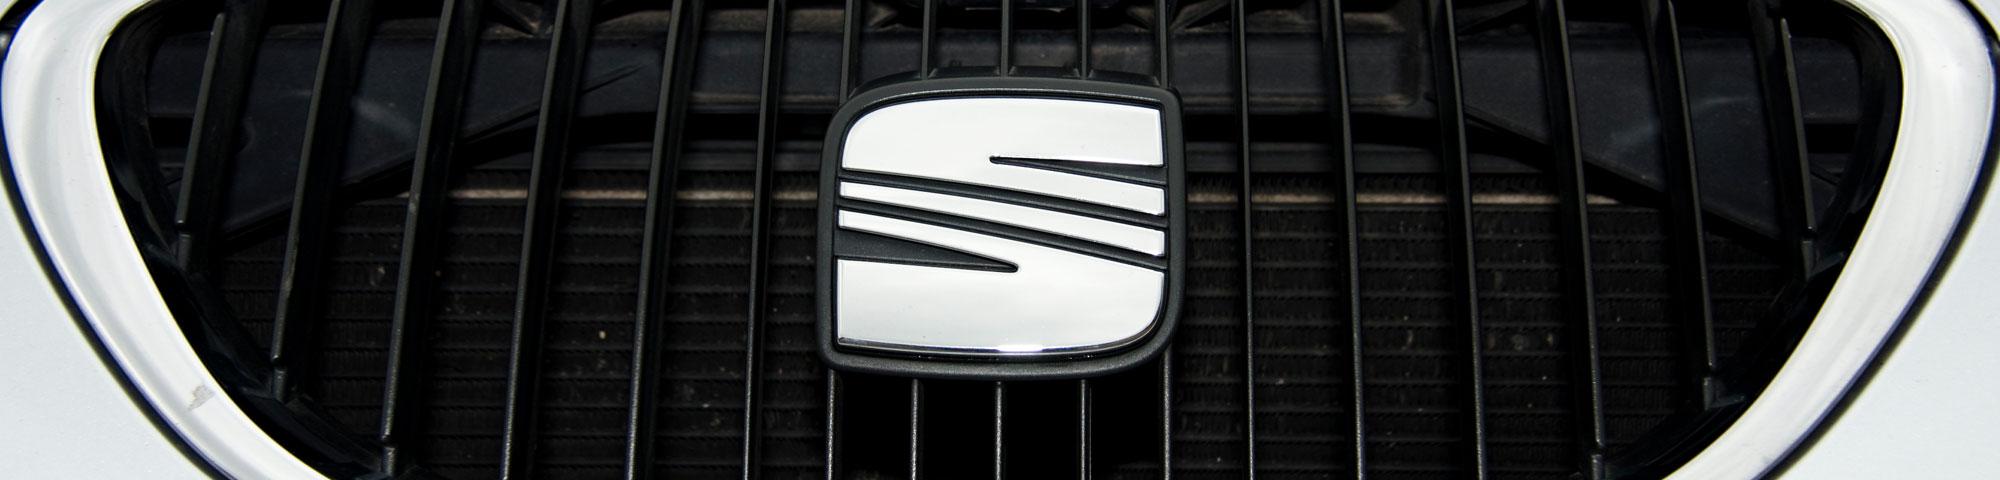 CLMS - Manufacturer - Seat